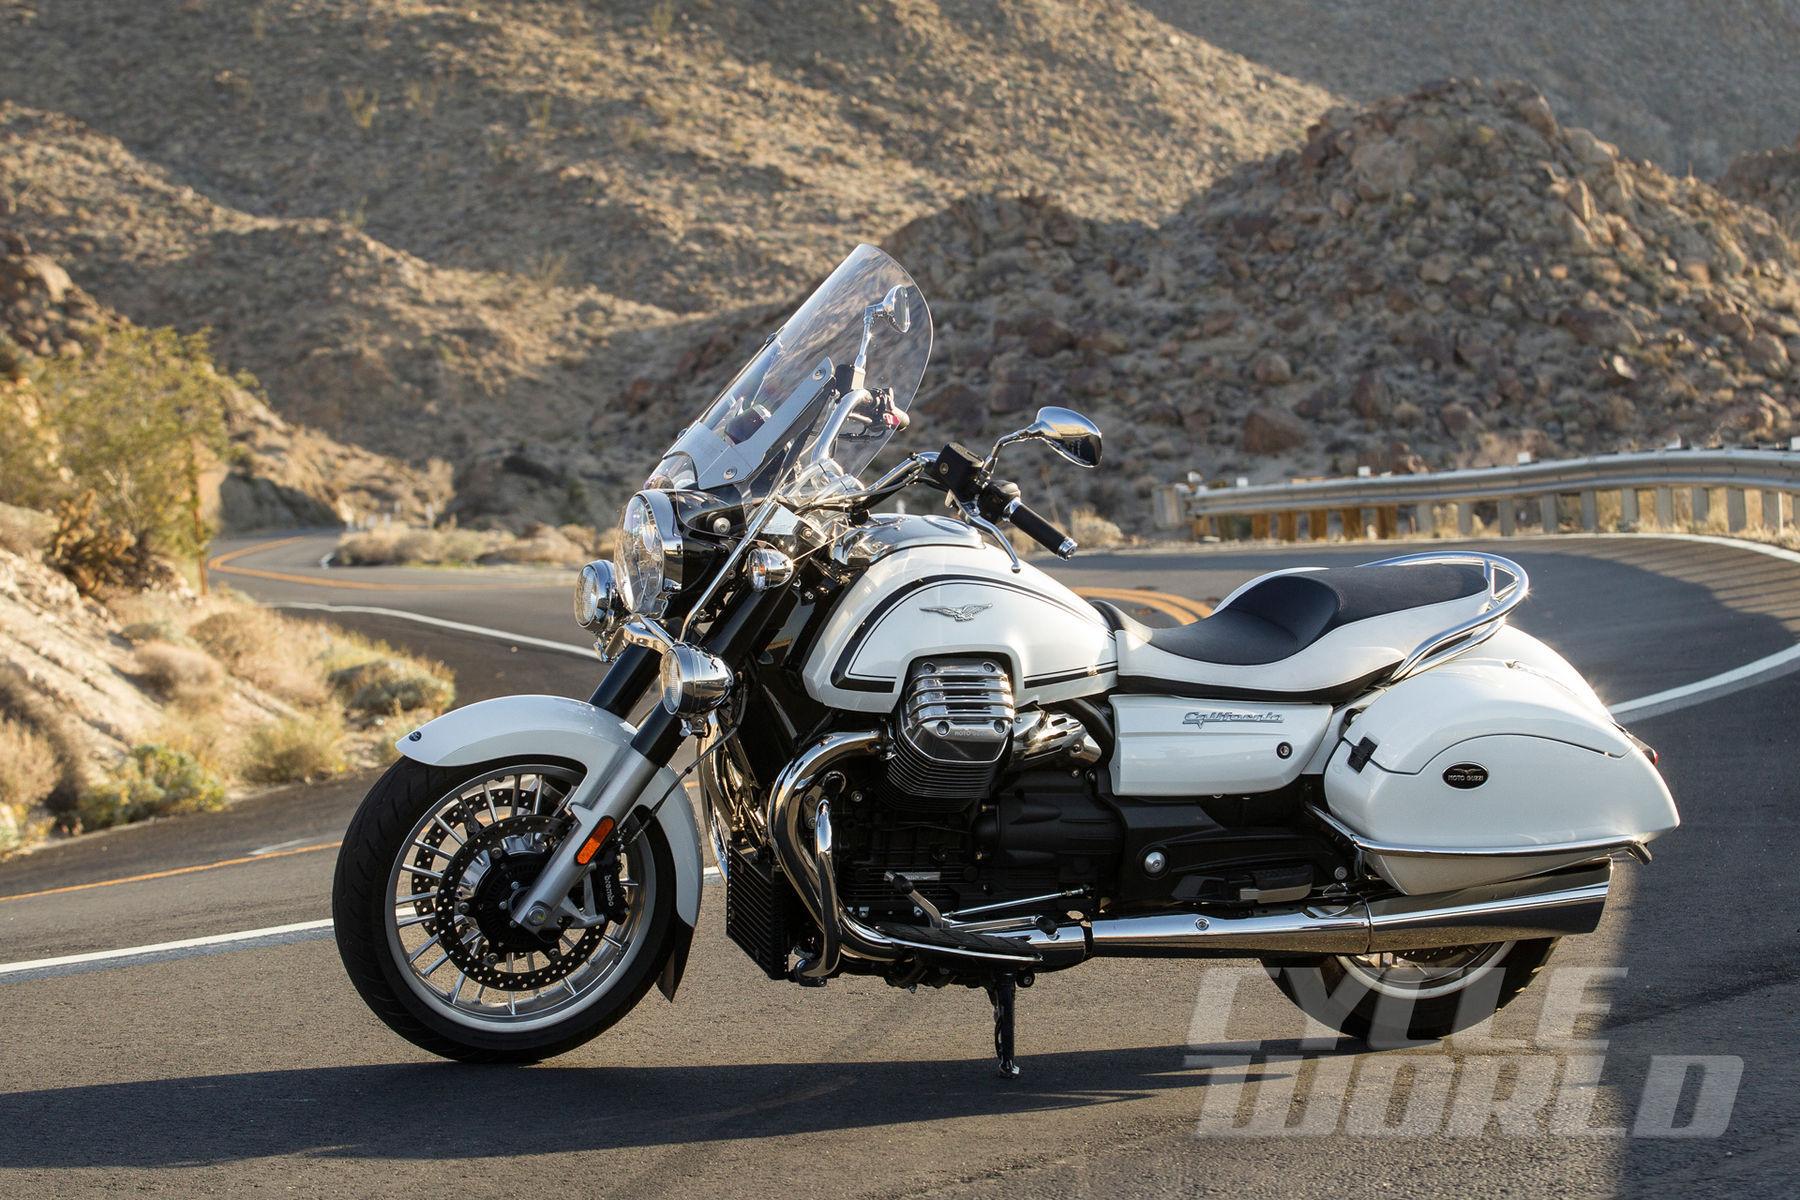 Moto Guzzi    Honda CTX1300 Deluxe vs. Moto Guzzi California 1400 Touring – Comparison Test